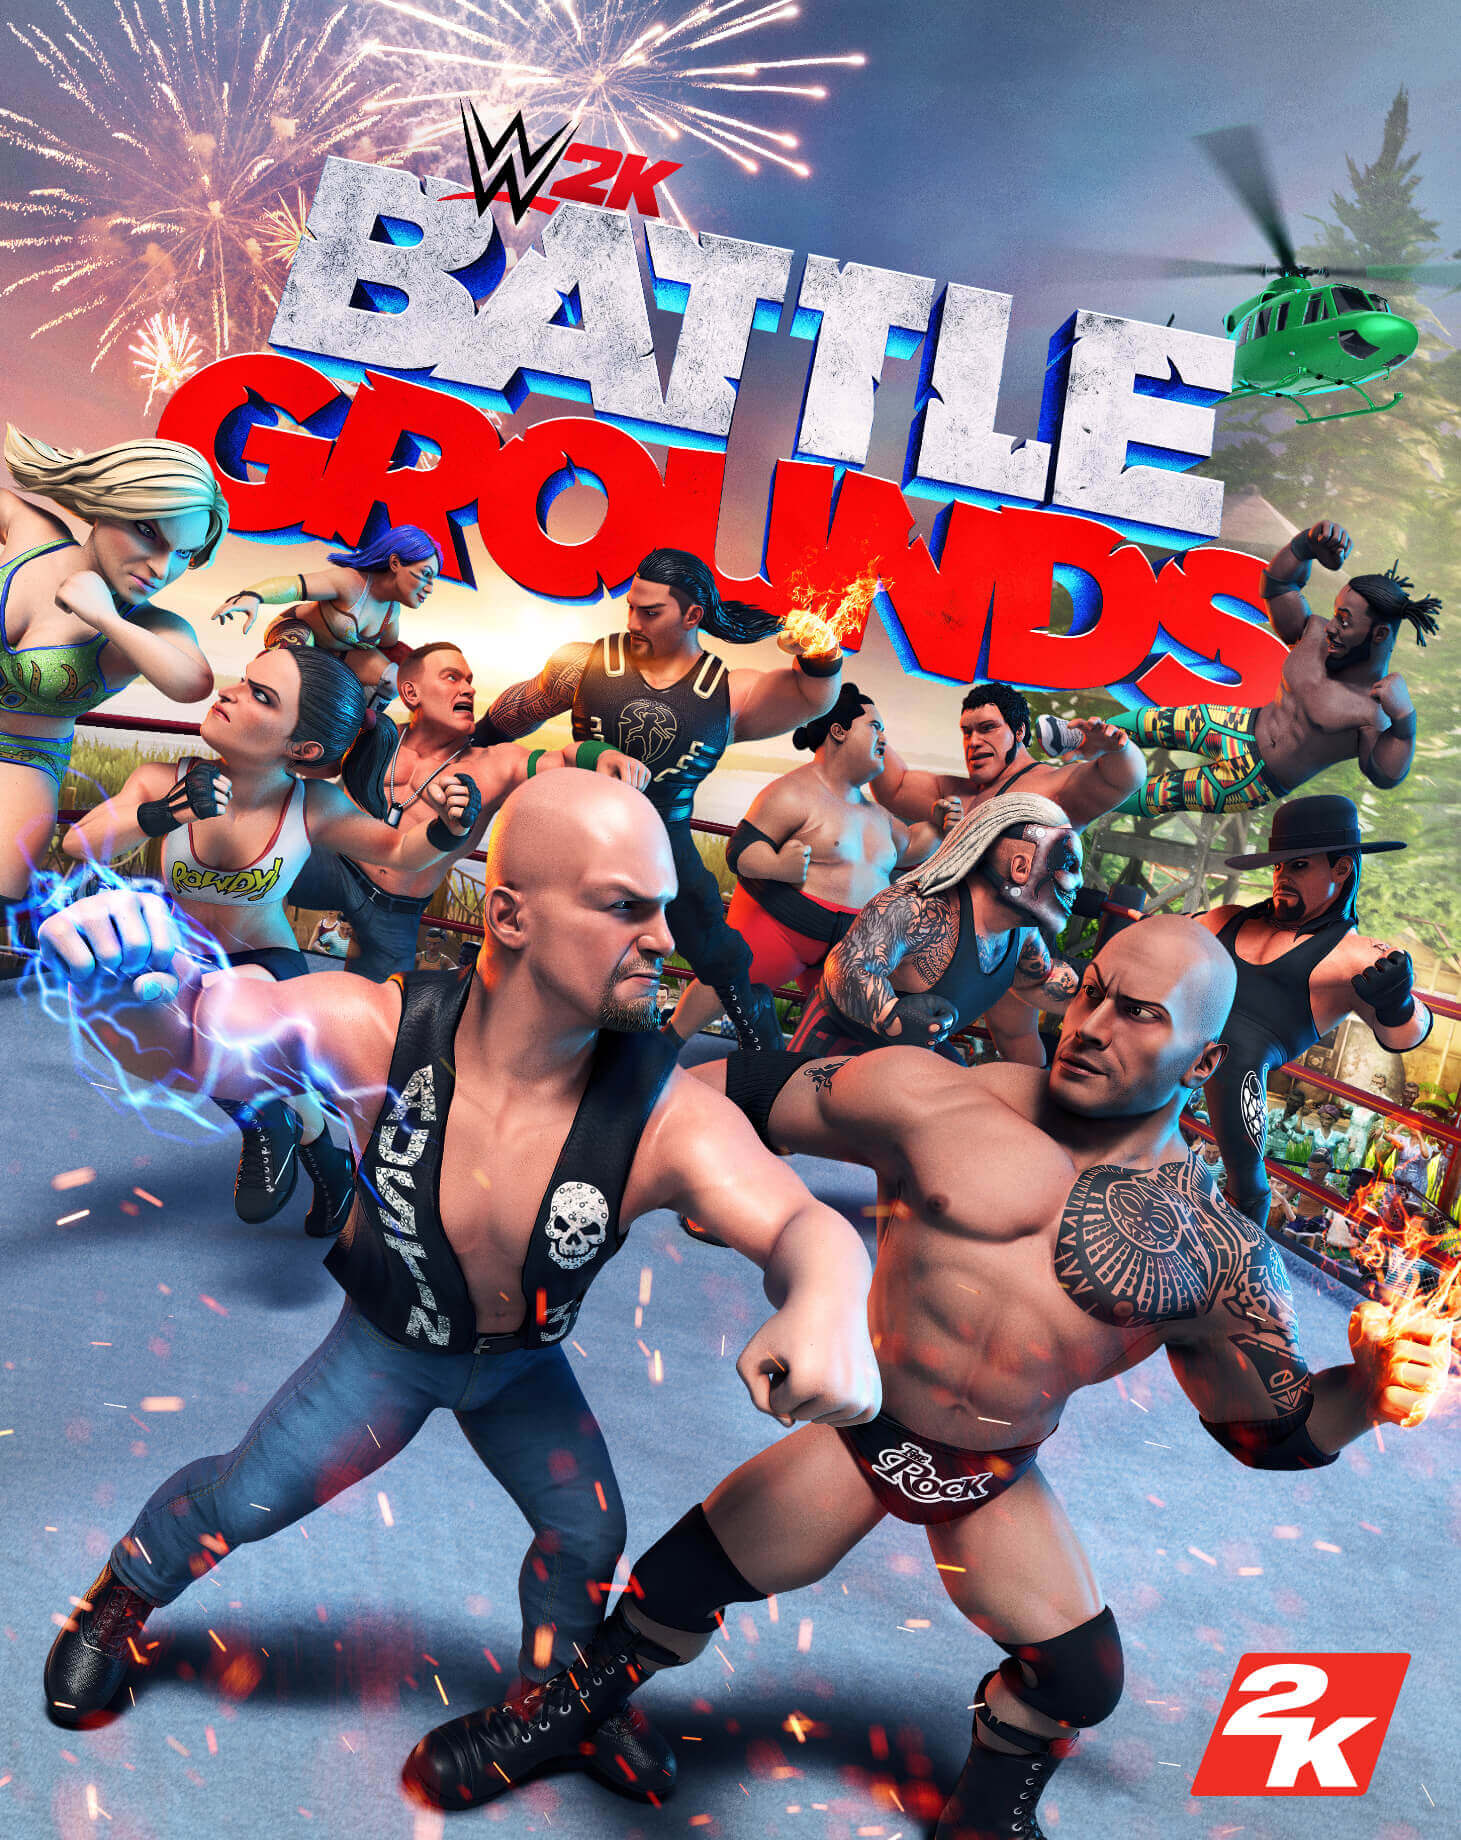 WWE 2K BattlegroundsDownload Free PC + Crack